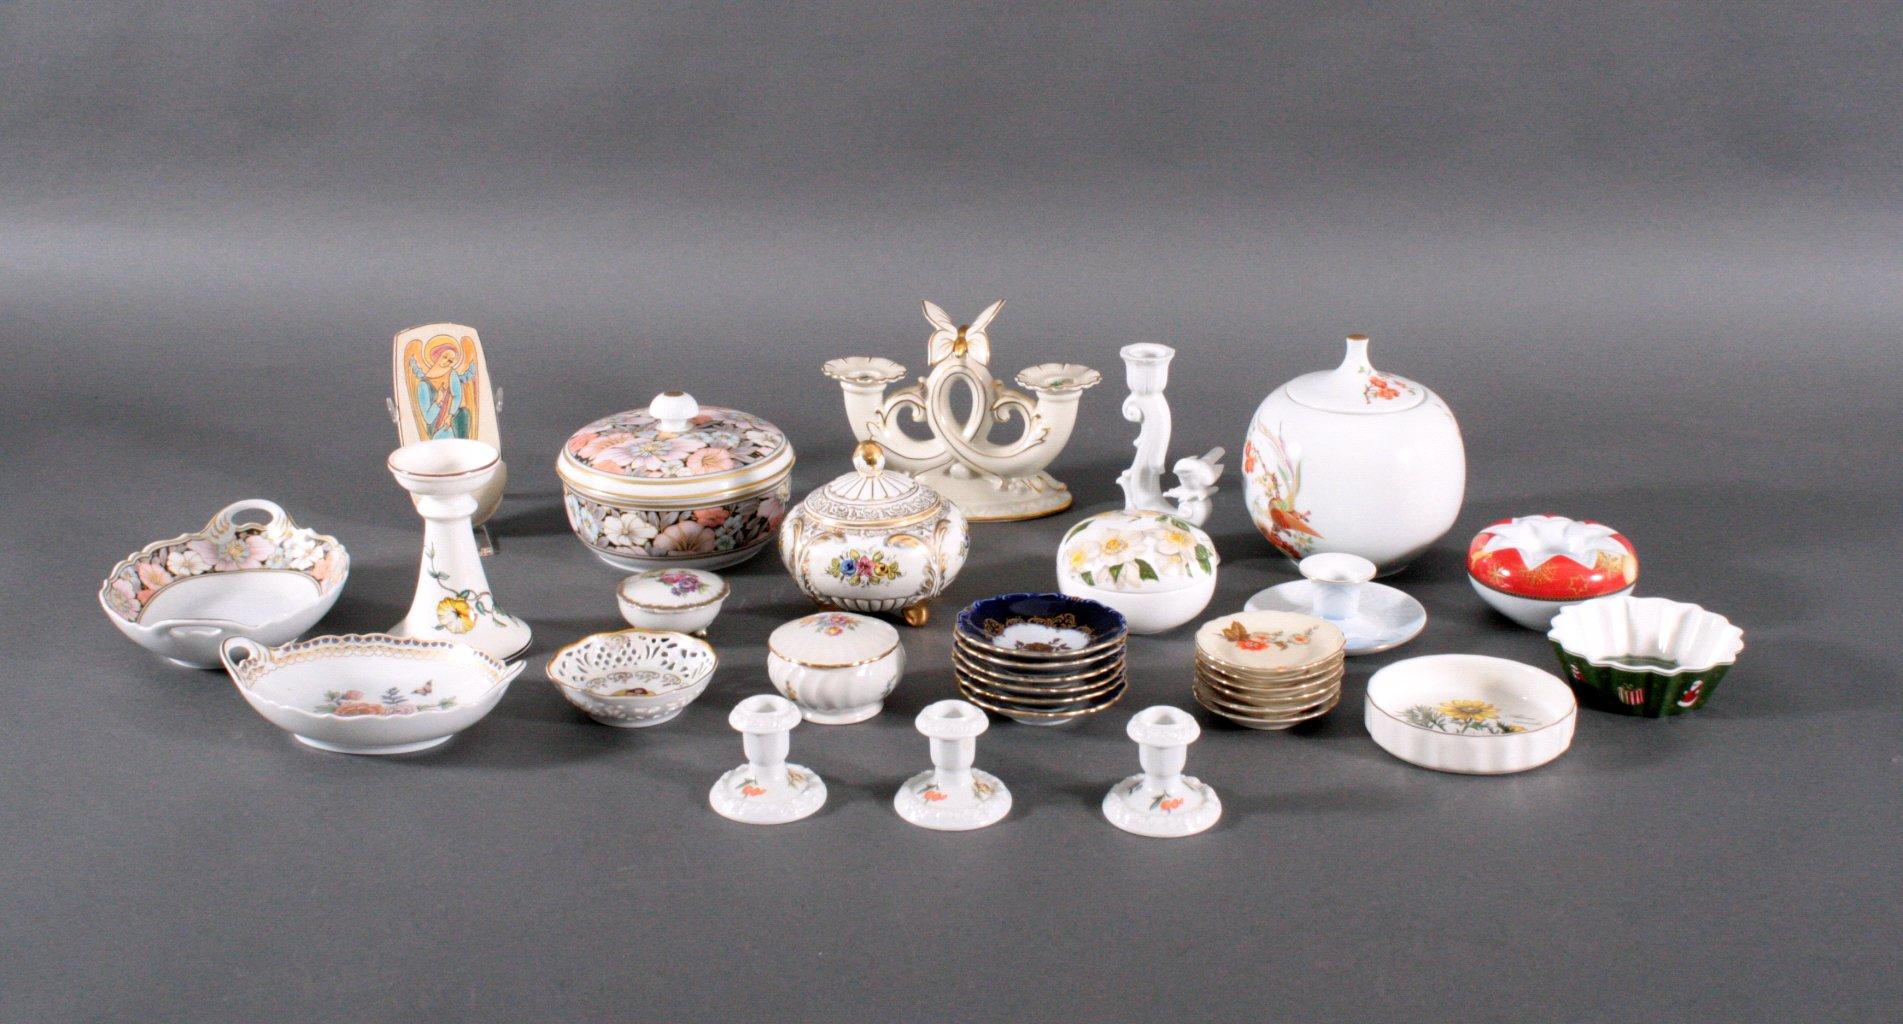 Großes Konvolut Porzellan und Keramik